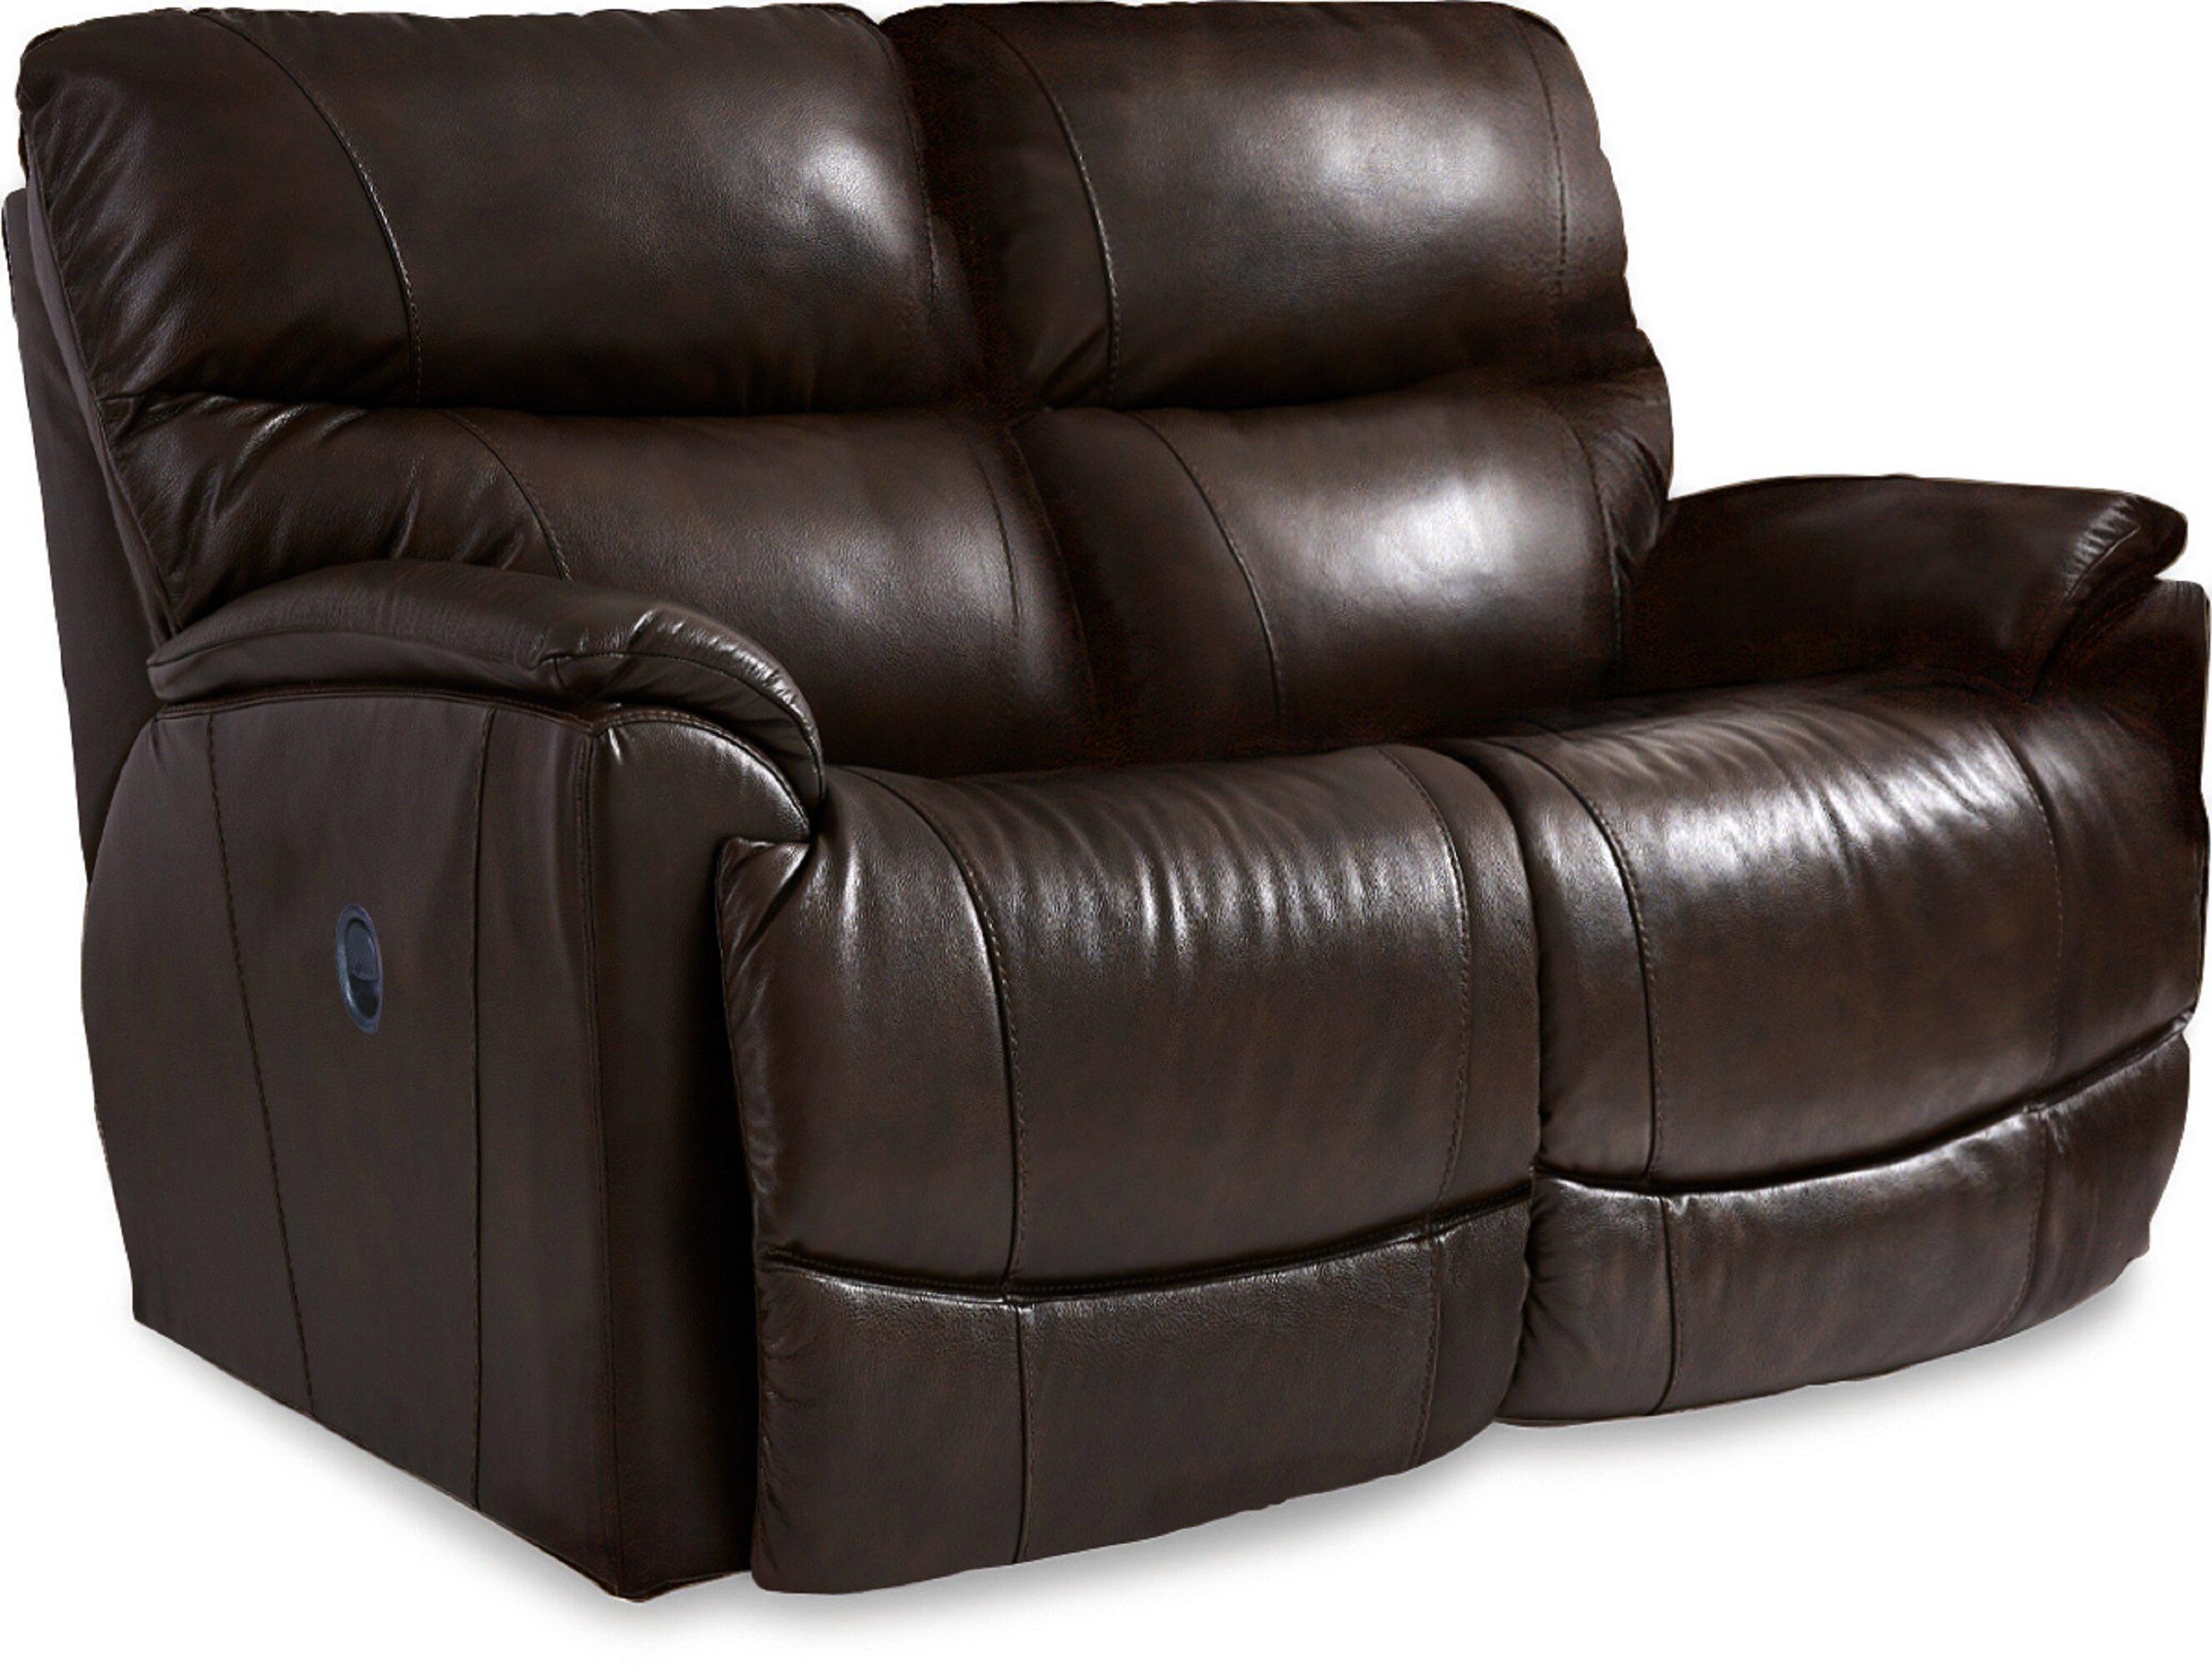 La Z Boy Trouper 62 Wide Leather Match Pillow Top Arm Reclining Loveseat Wayfair